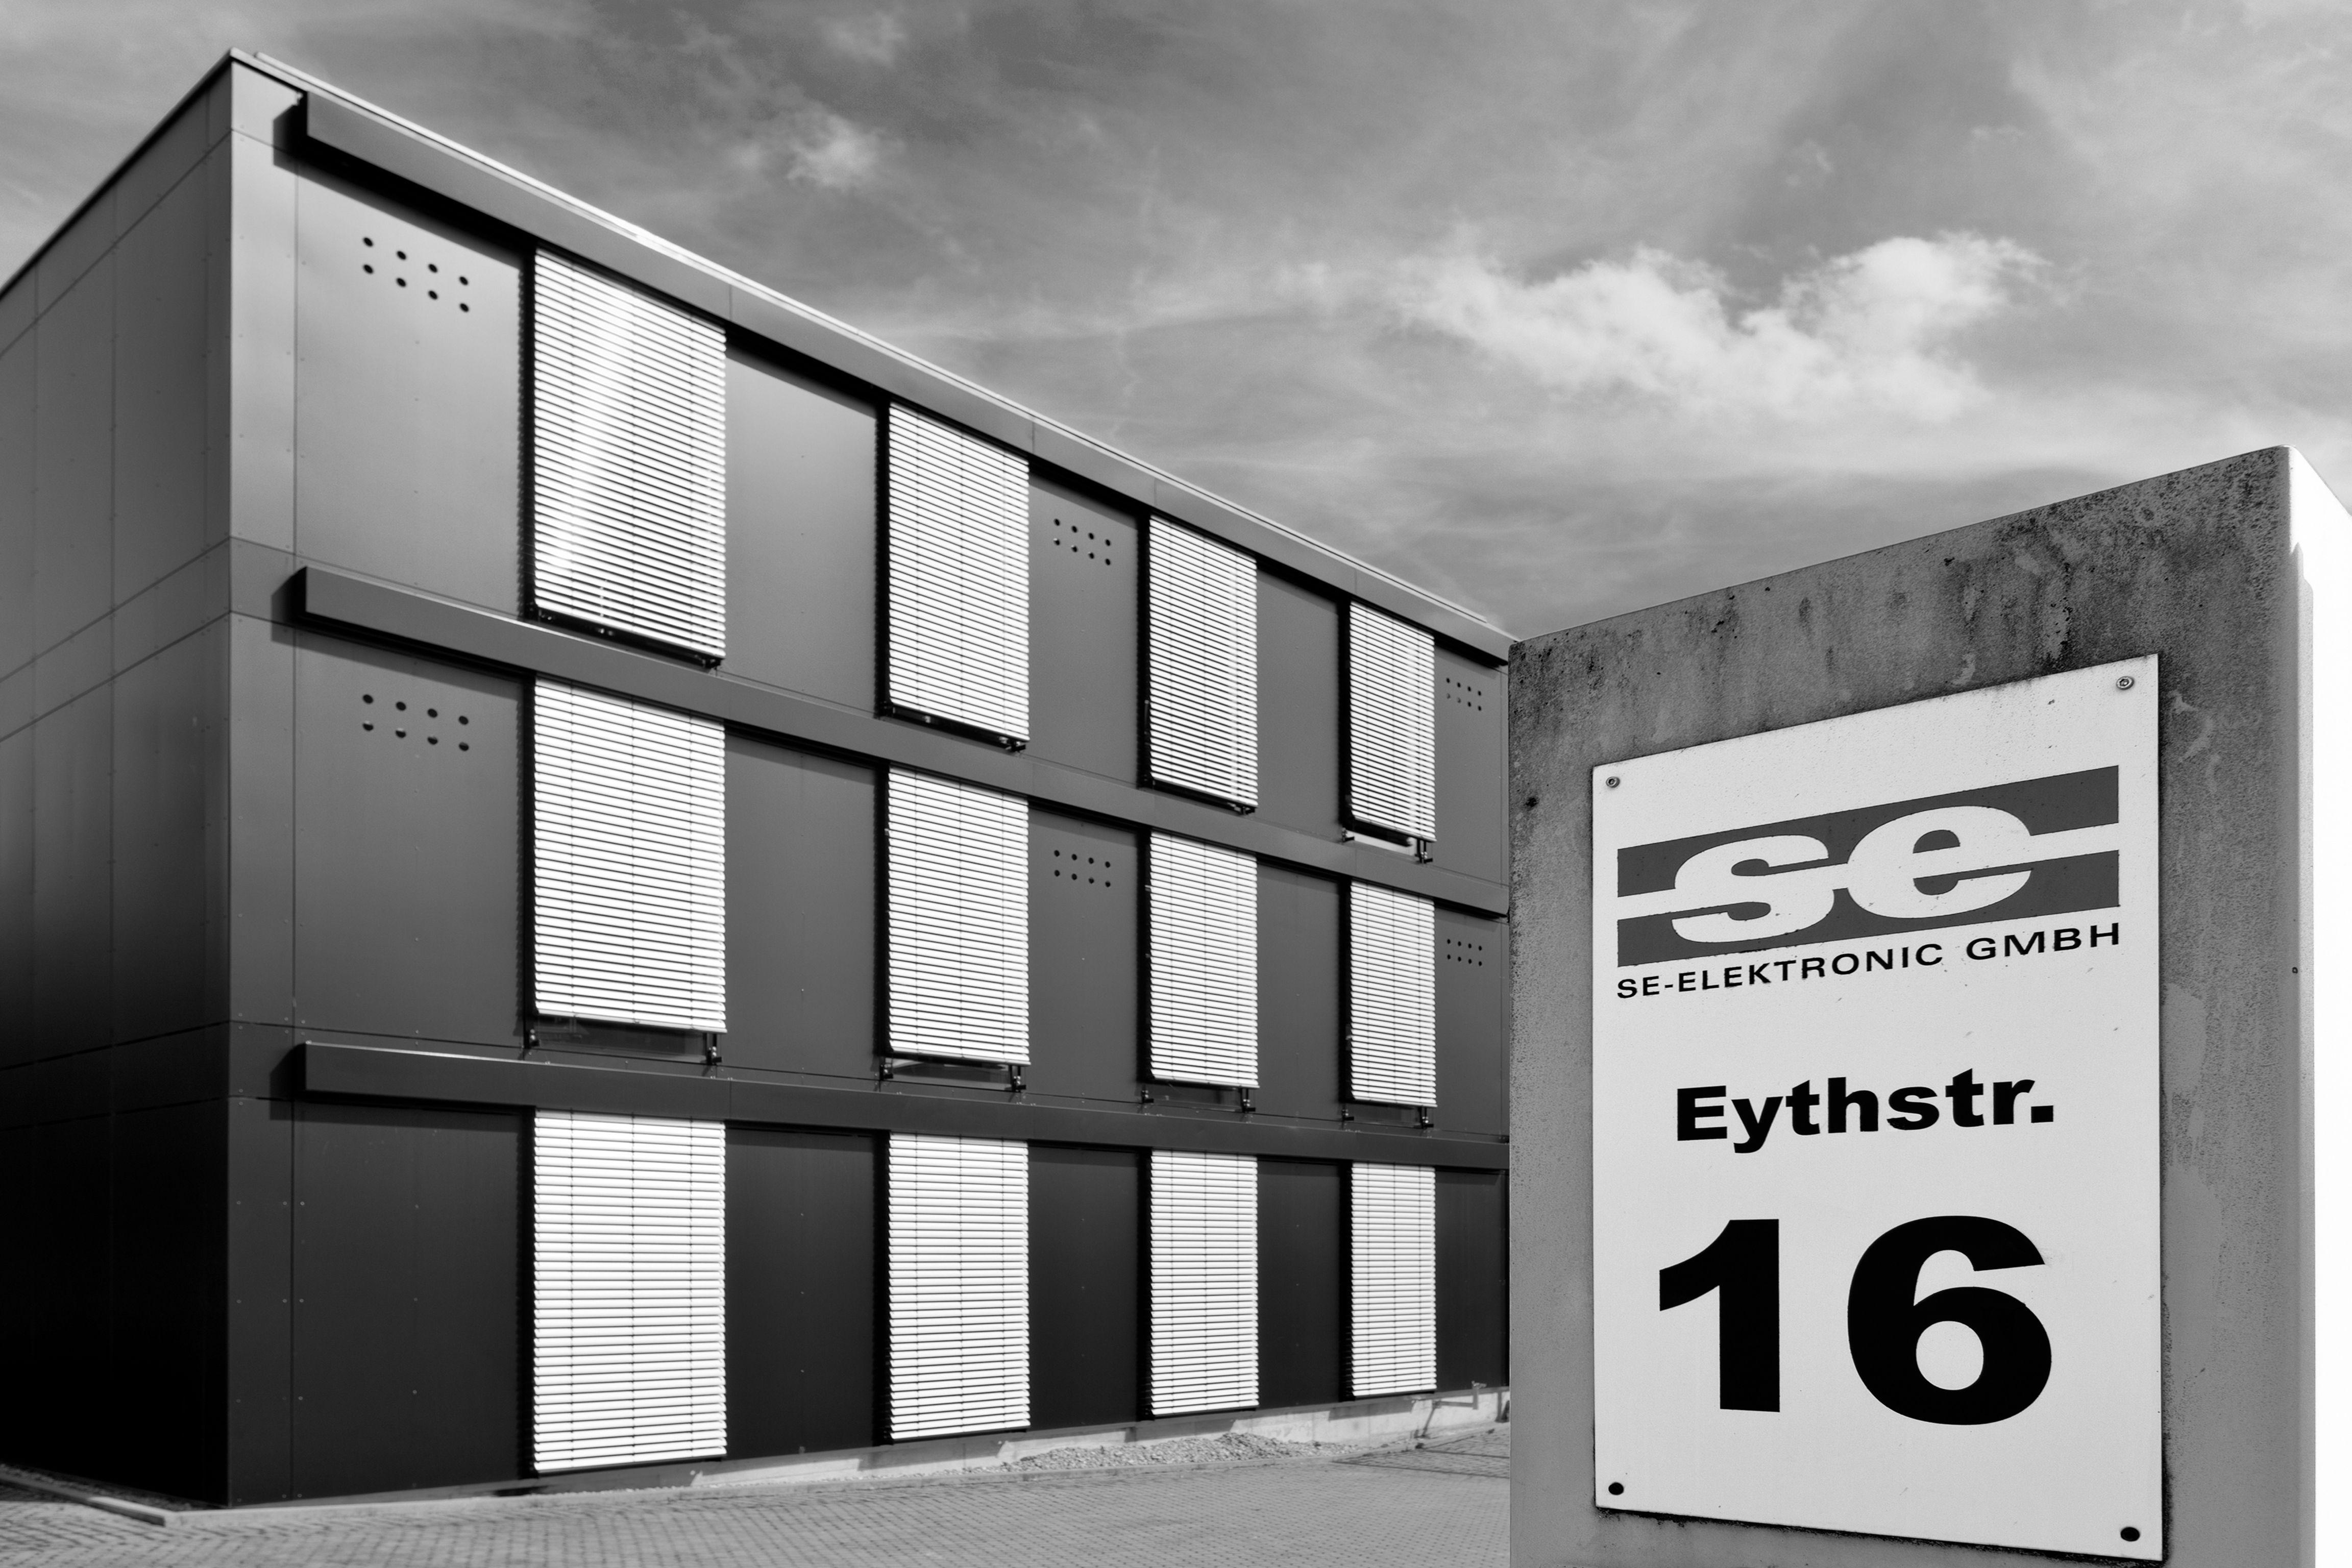 Brückentag bei SE-Elektronic GmbH Göppingen